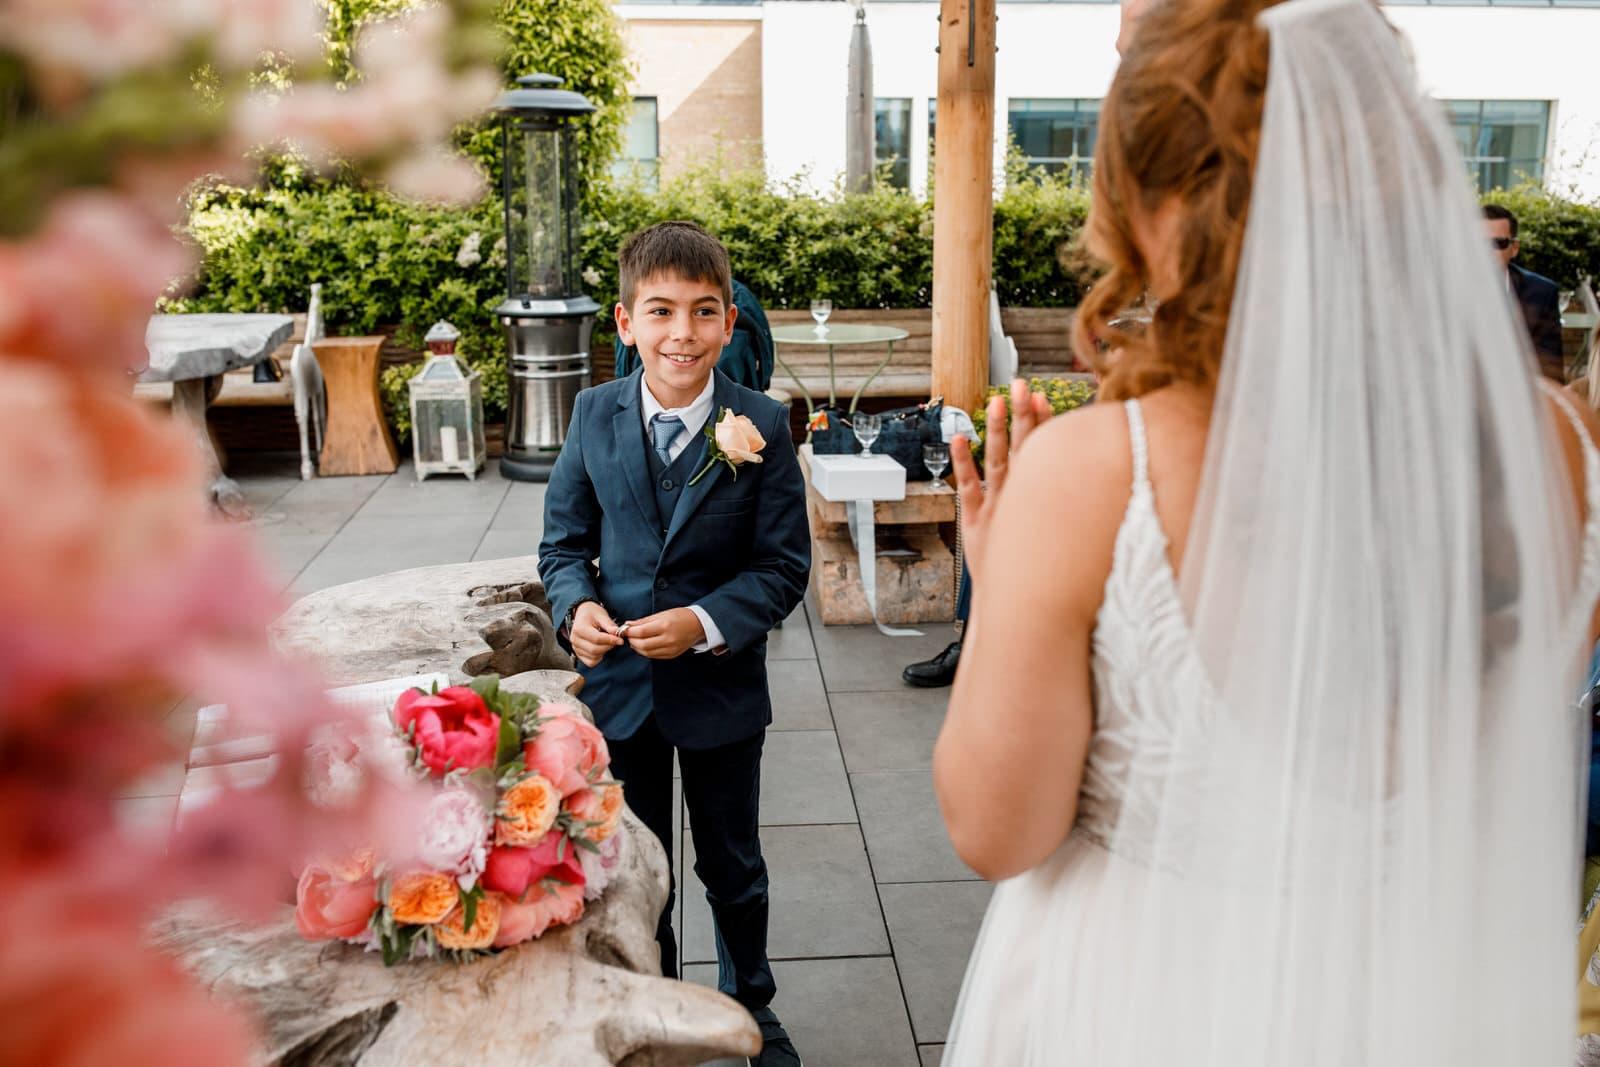 page boy as ring bearer at wedding